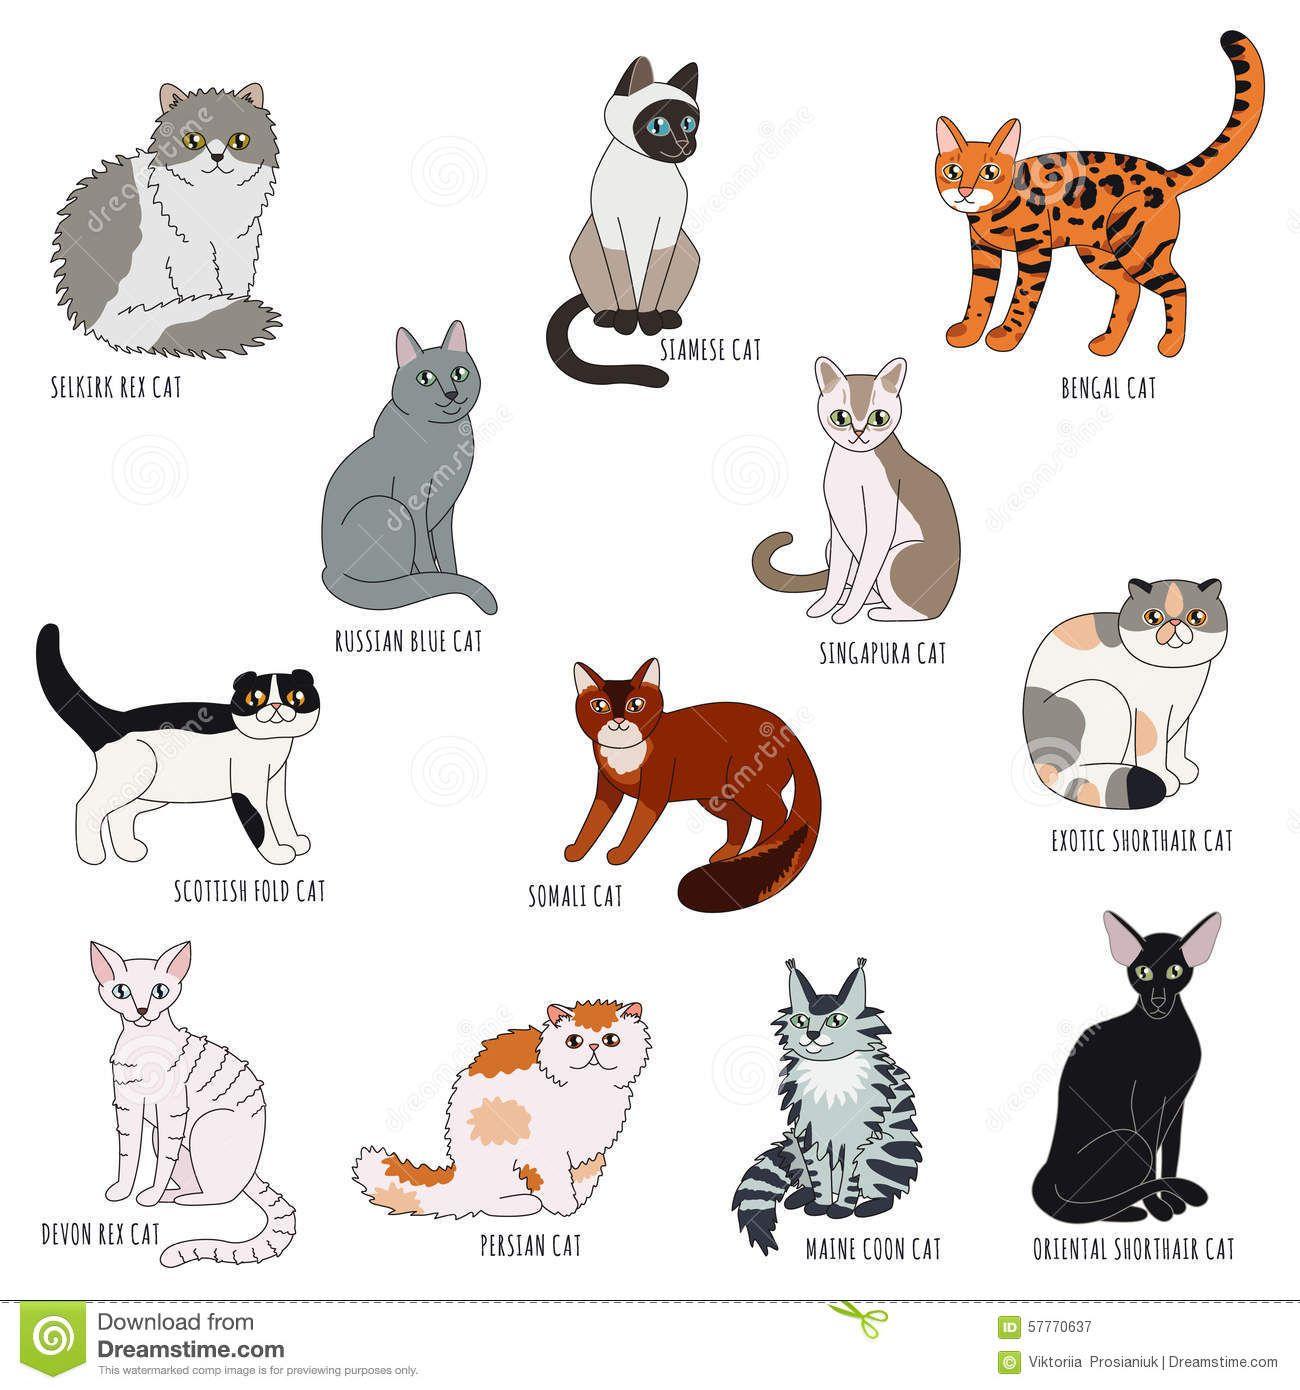 Sentence Structure N+is+Adj Cartoon styles, Cat breeds